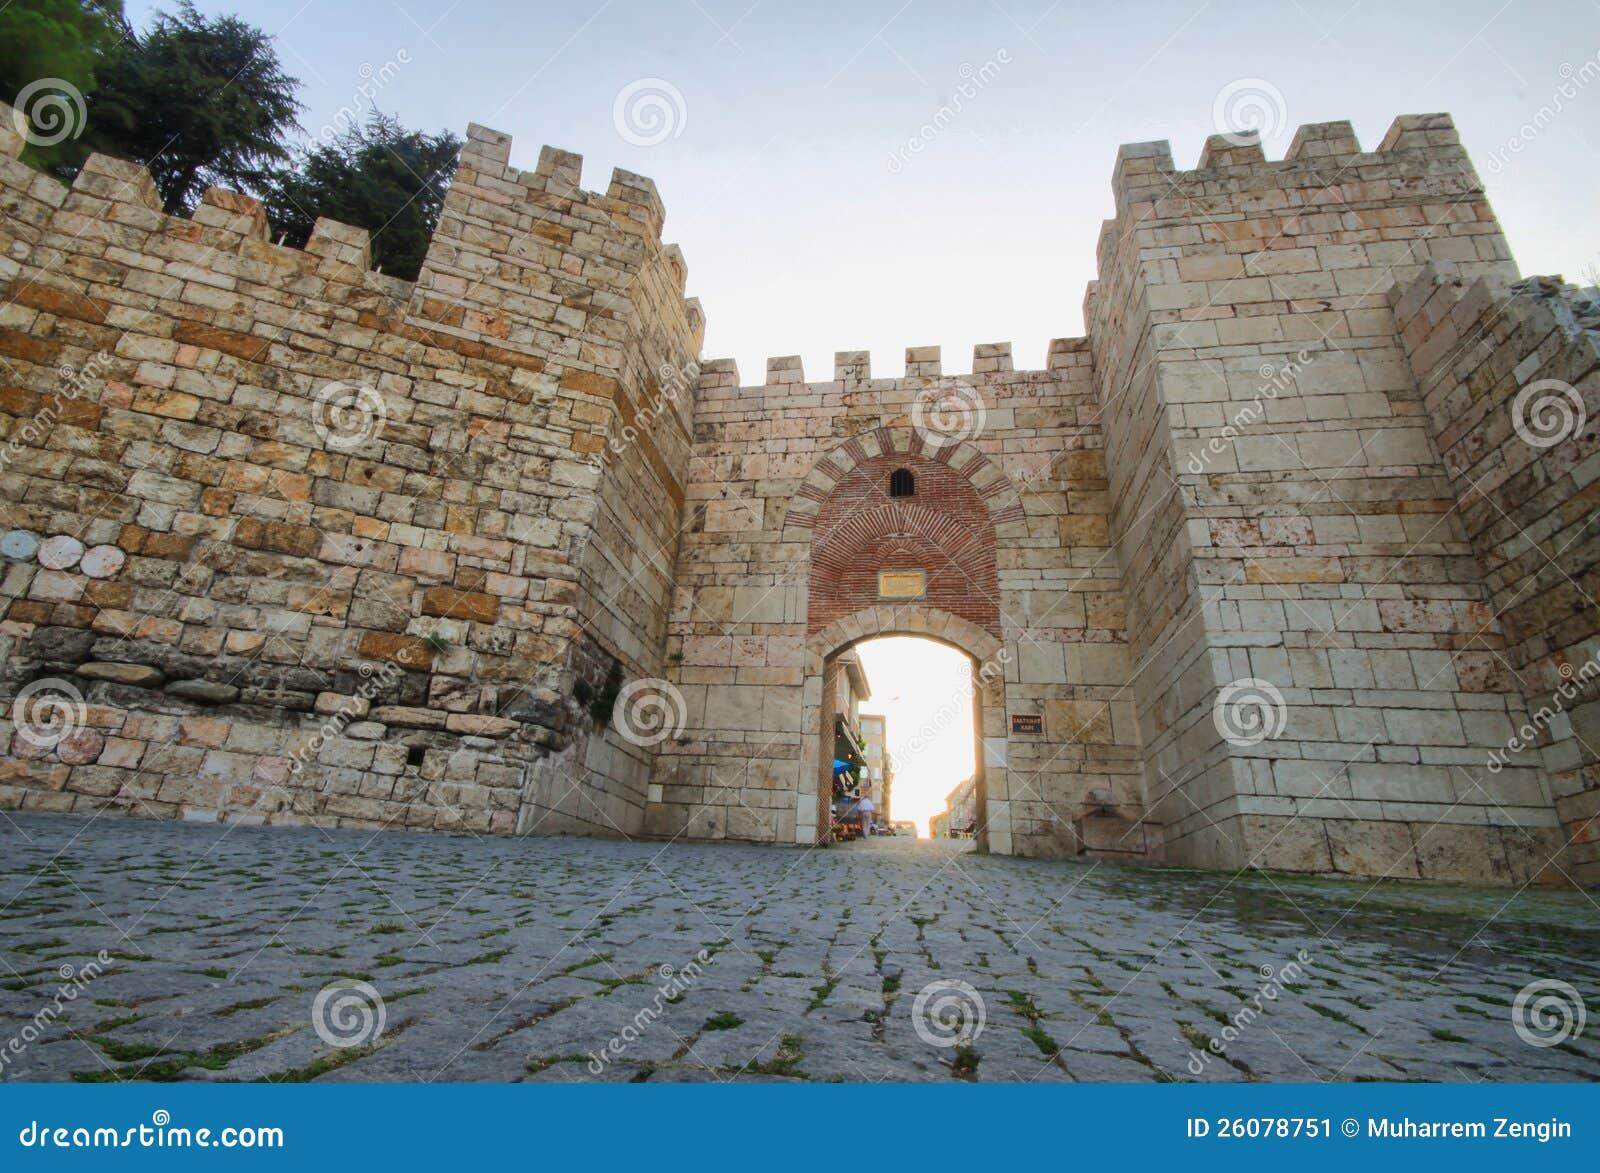 Bursa Citywalls Stock Image - Image: 26078751